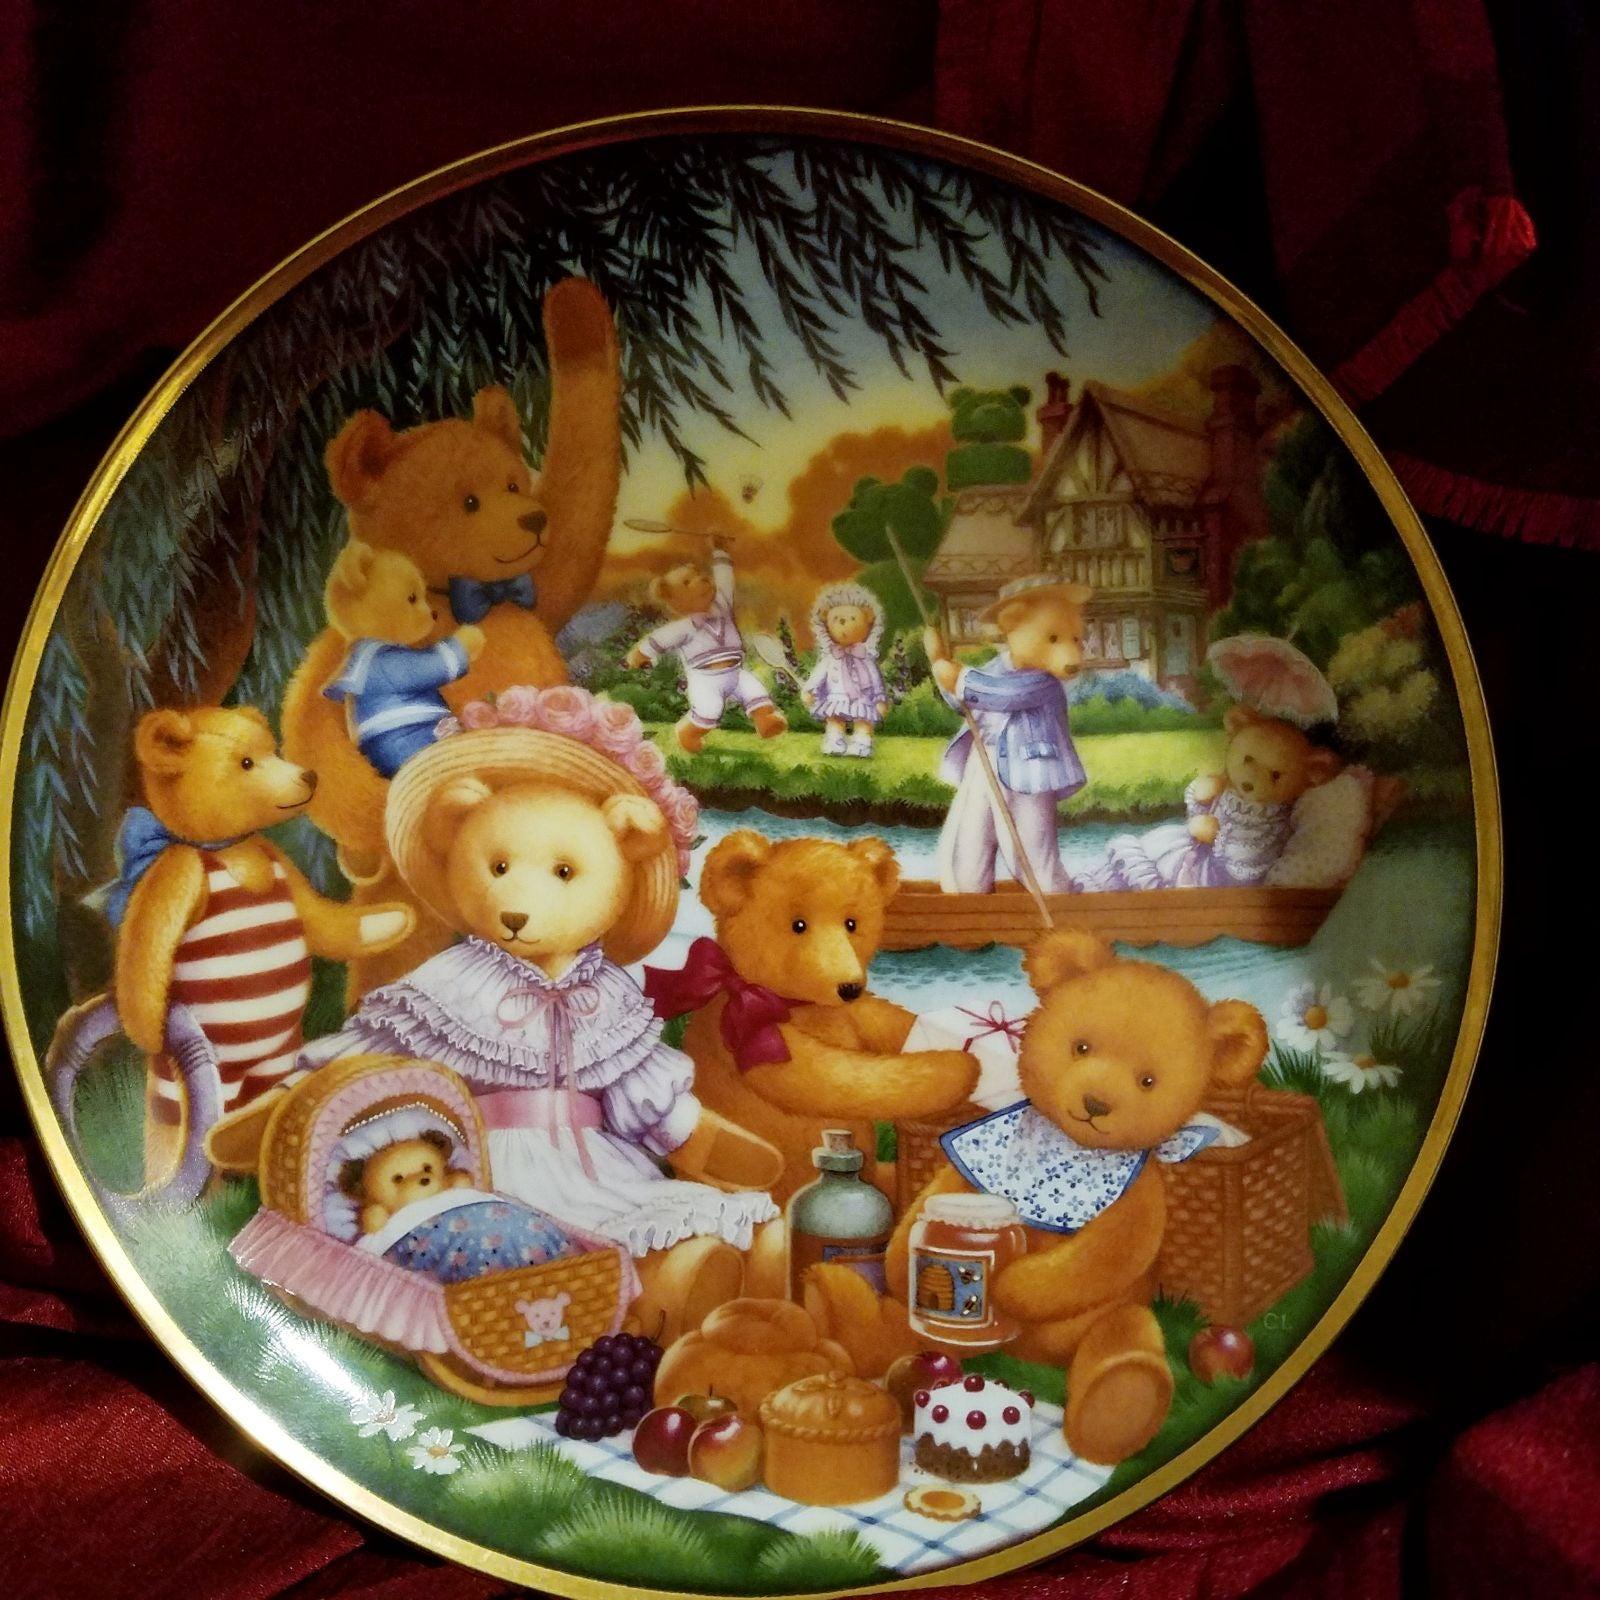 Plate, Franklin Mint, Teddy Bear Picnic